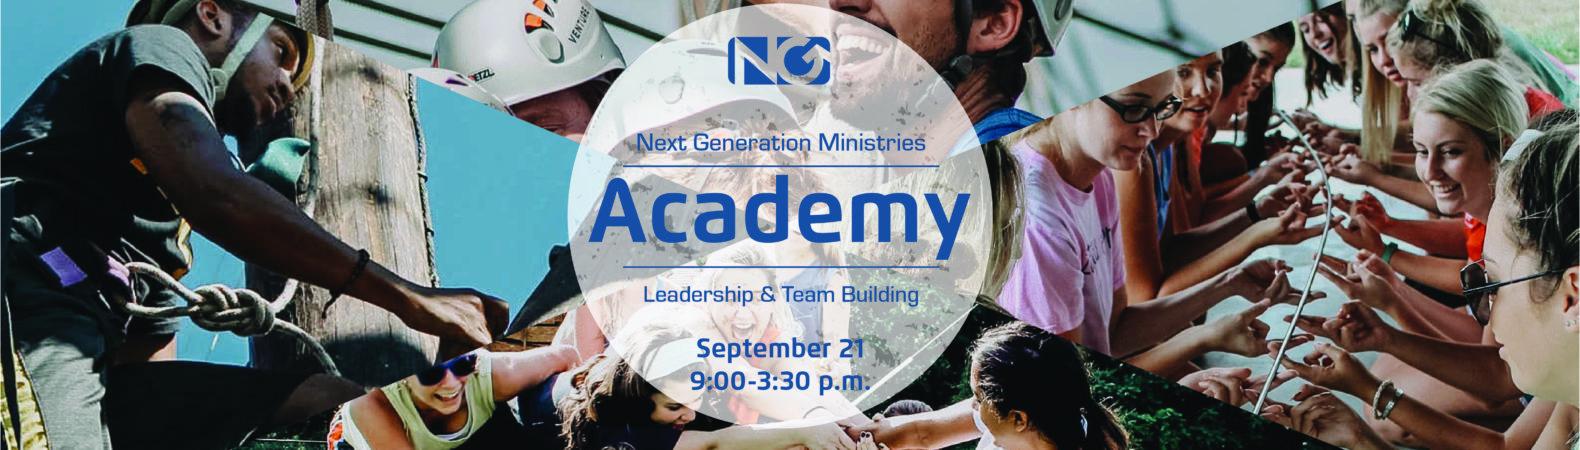 NextGen Academy | NextGen Ministries